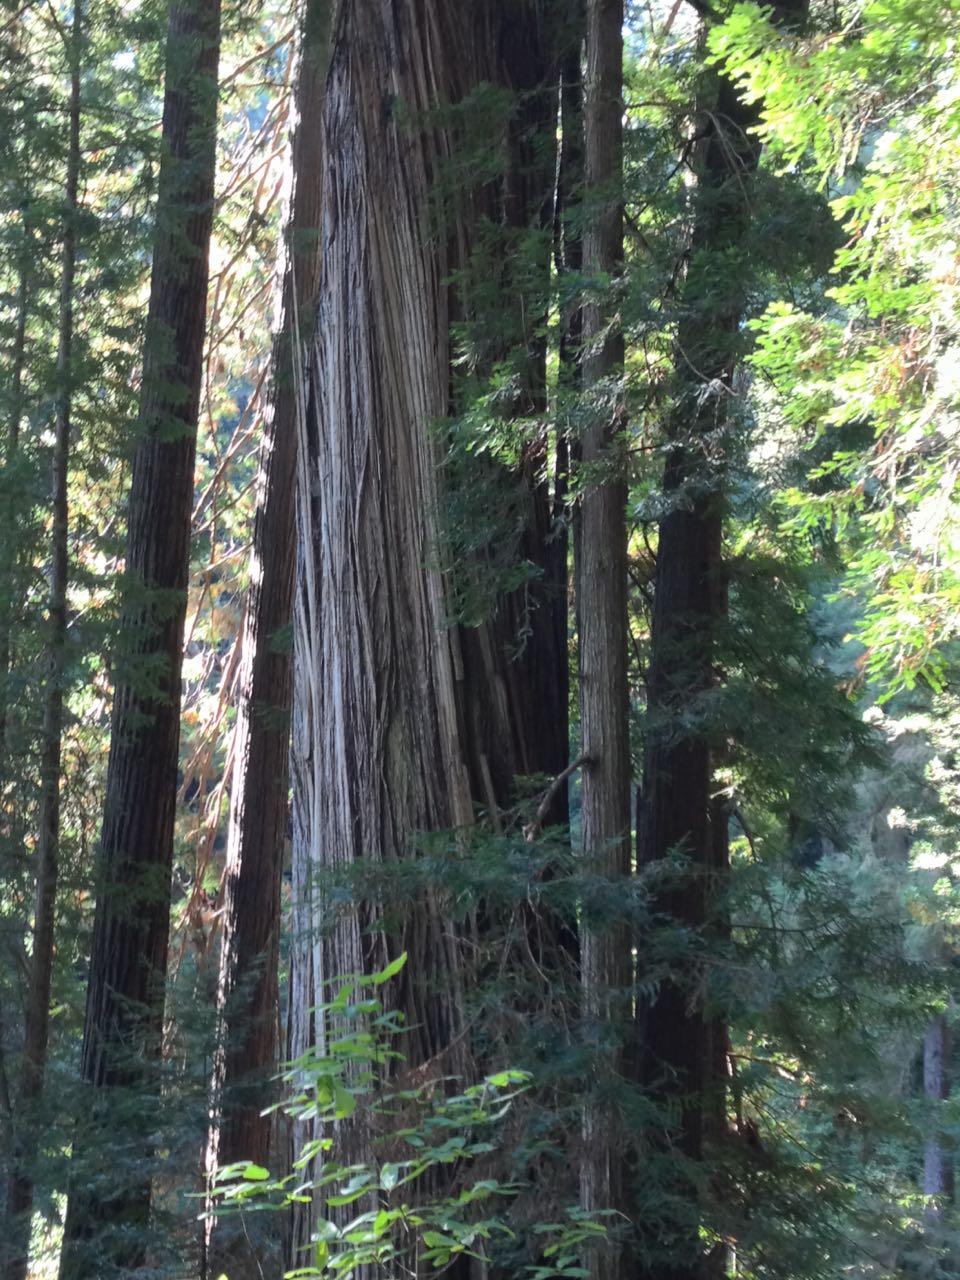 Redwoods 2017 10 01 174 Of 244